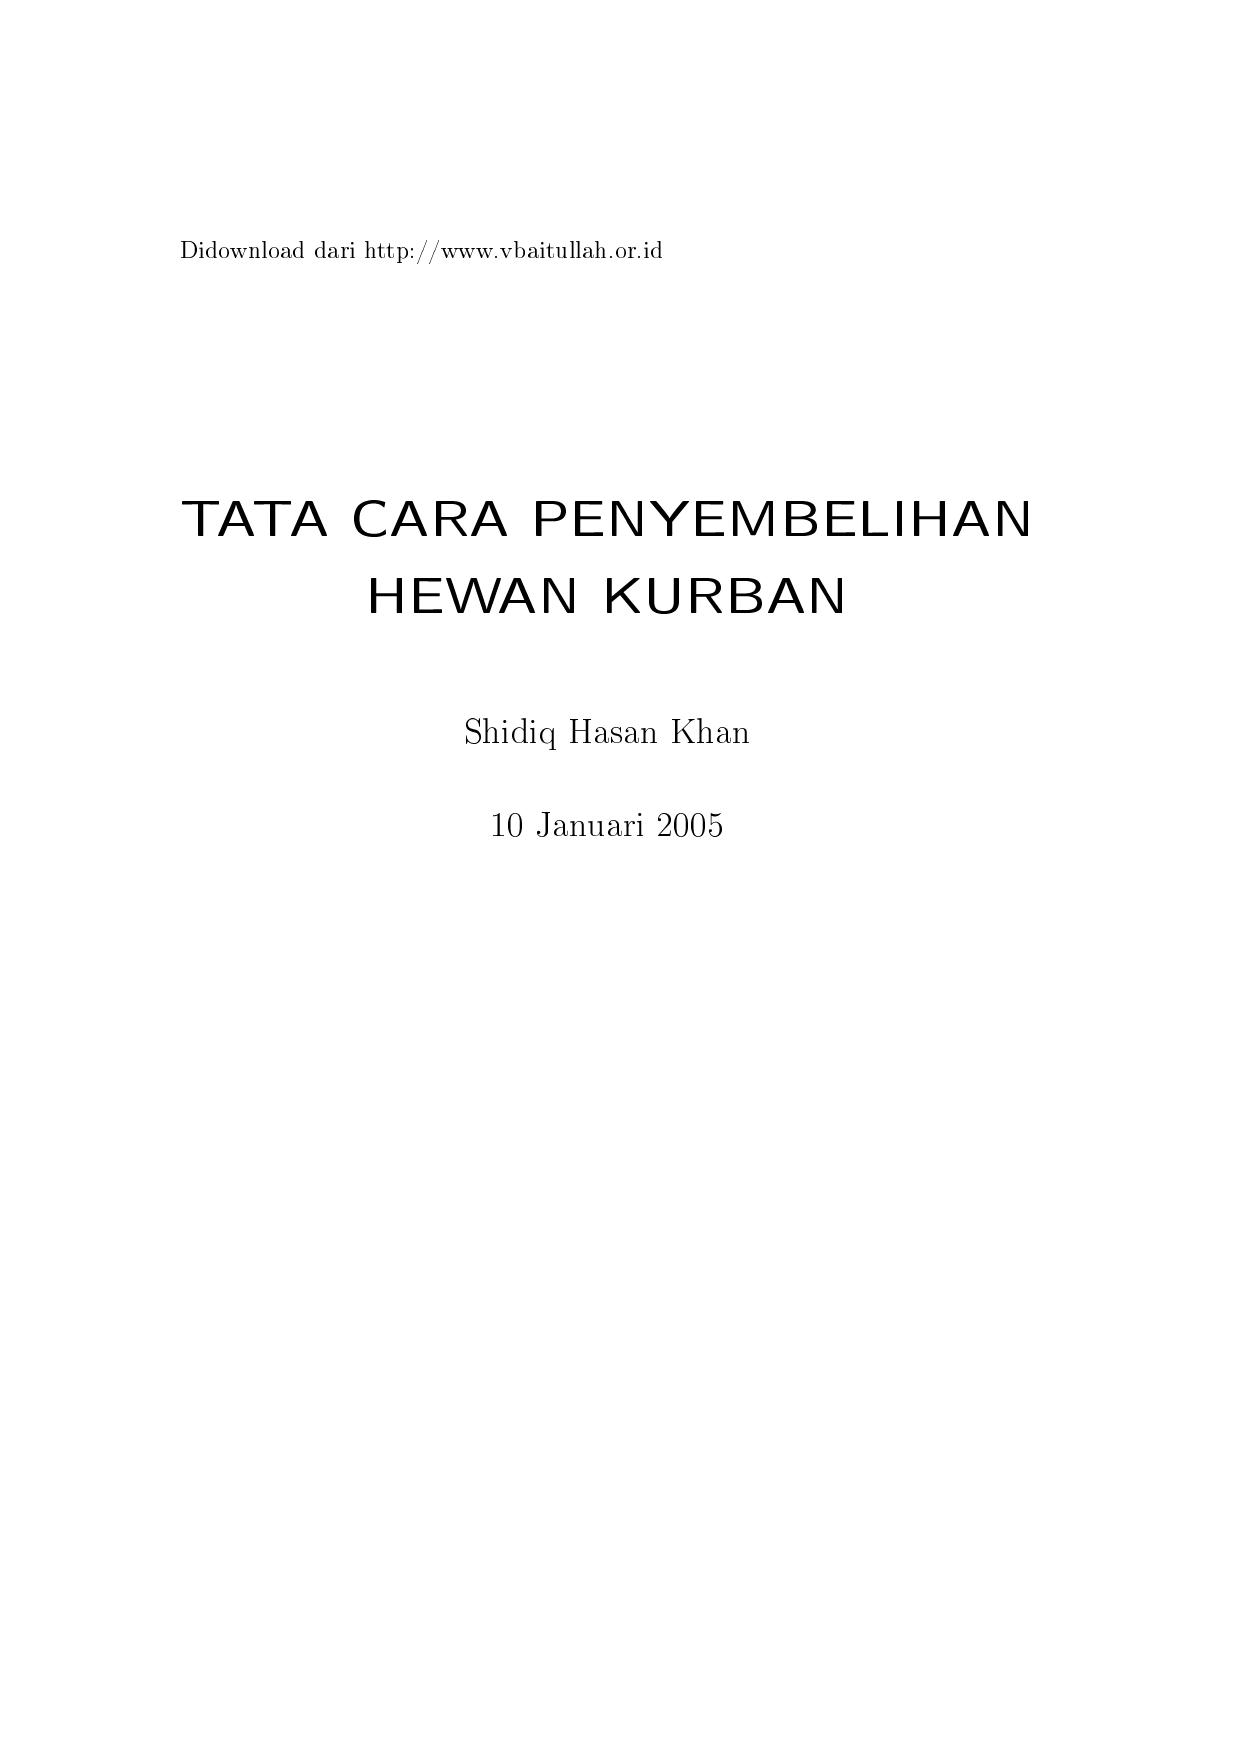 950+ Gambar Tata Cara Penyembelihan Hewan Qurban HD